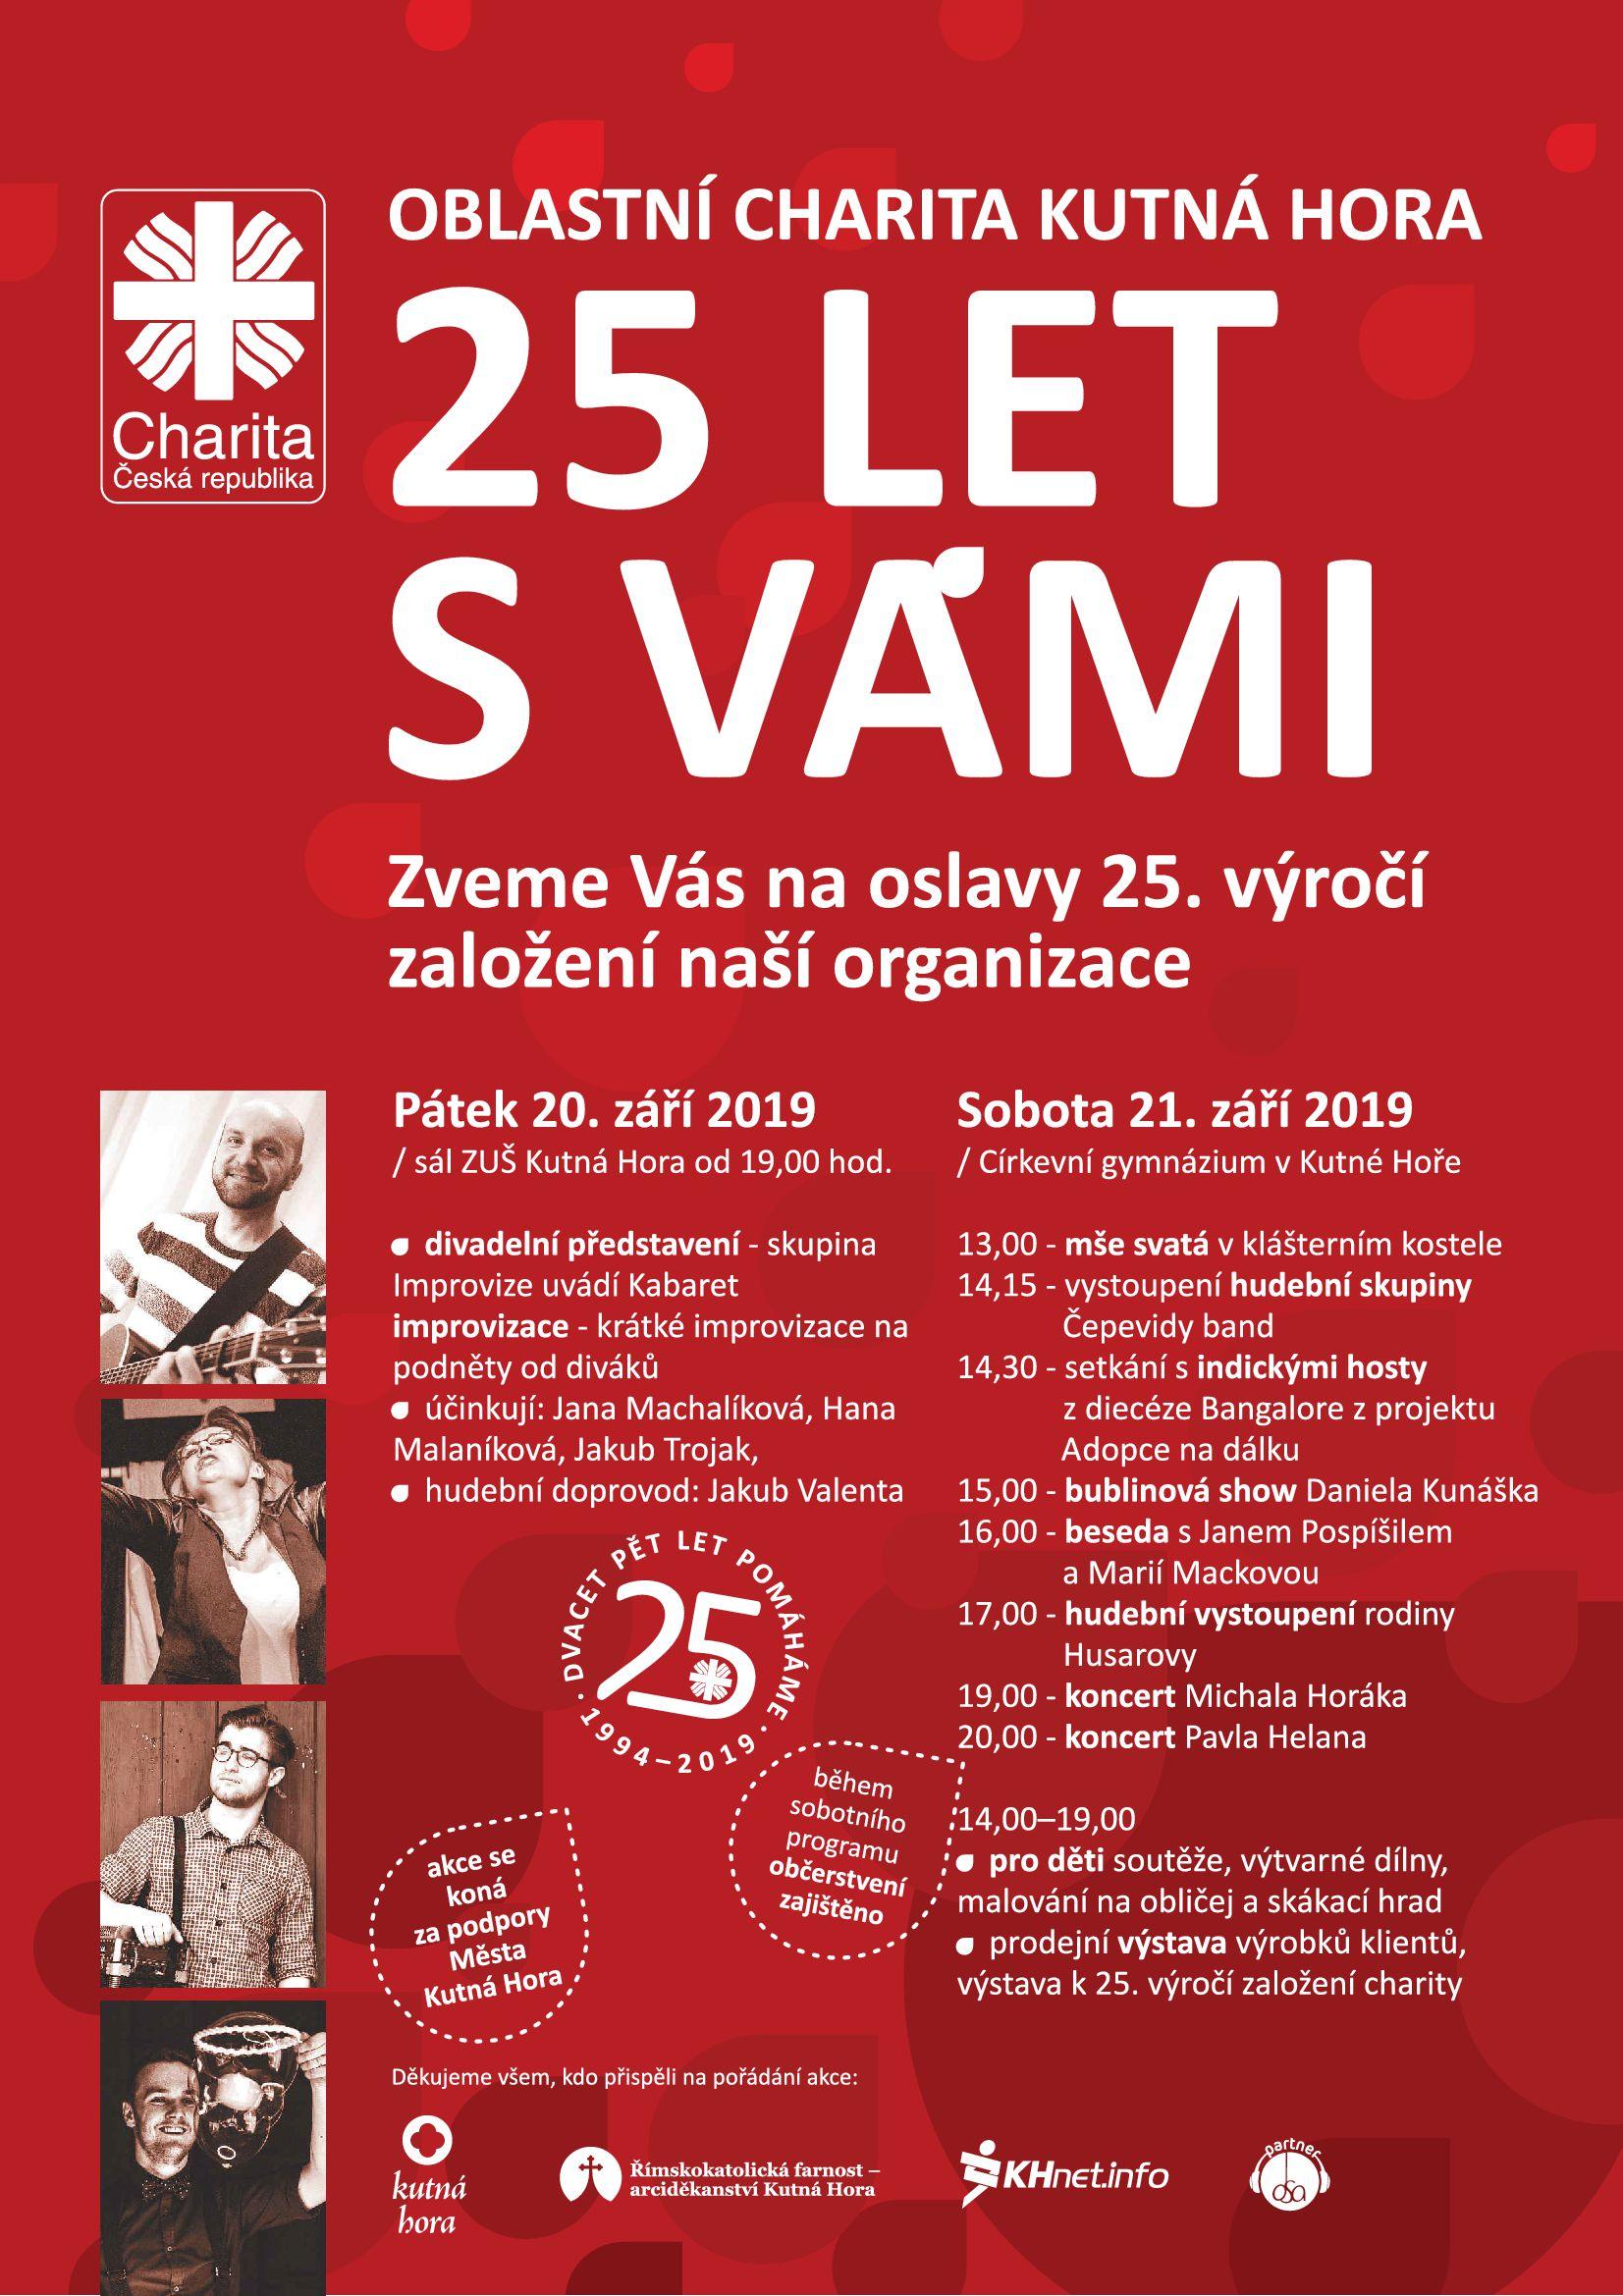 6544-oslavy-25-vyroci-plakat.jpg